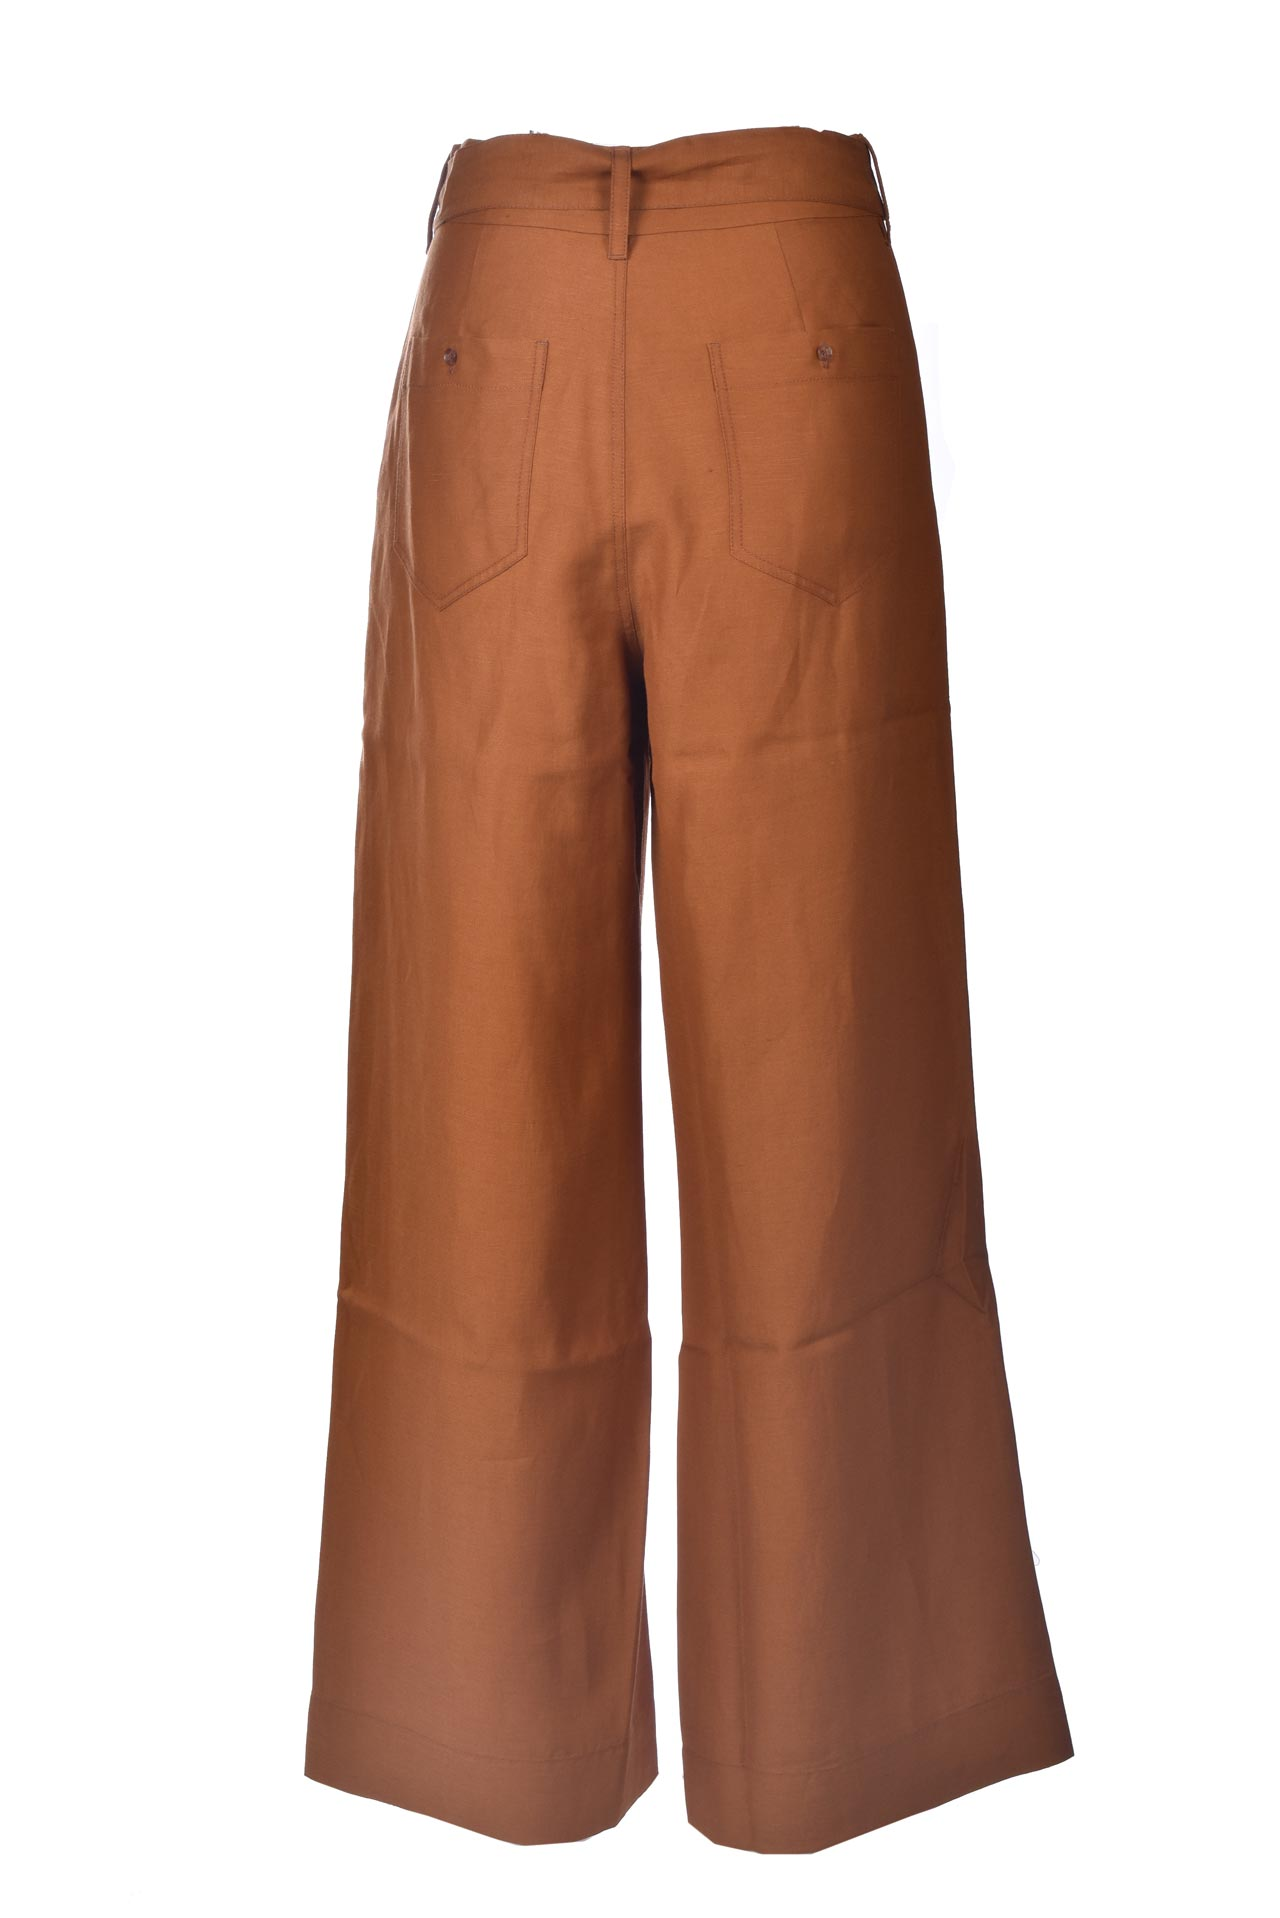 Pantaloni palazzo a vita alta ruggine ANTIK BATIK   Pantaloni   OSCAR1PANRUST